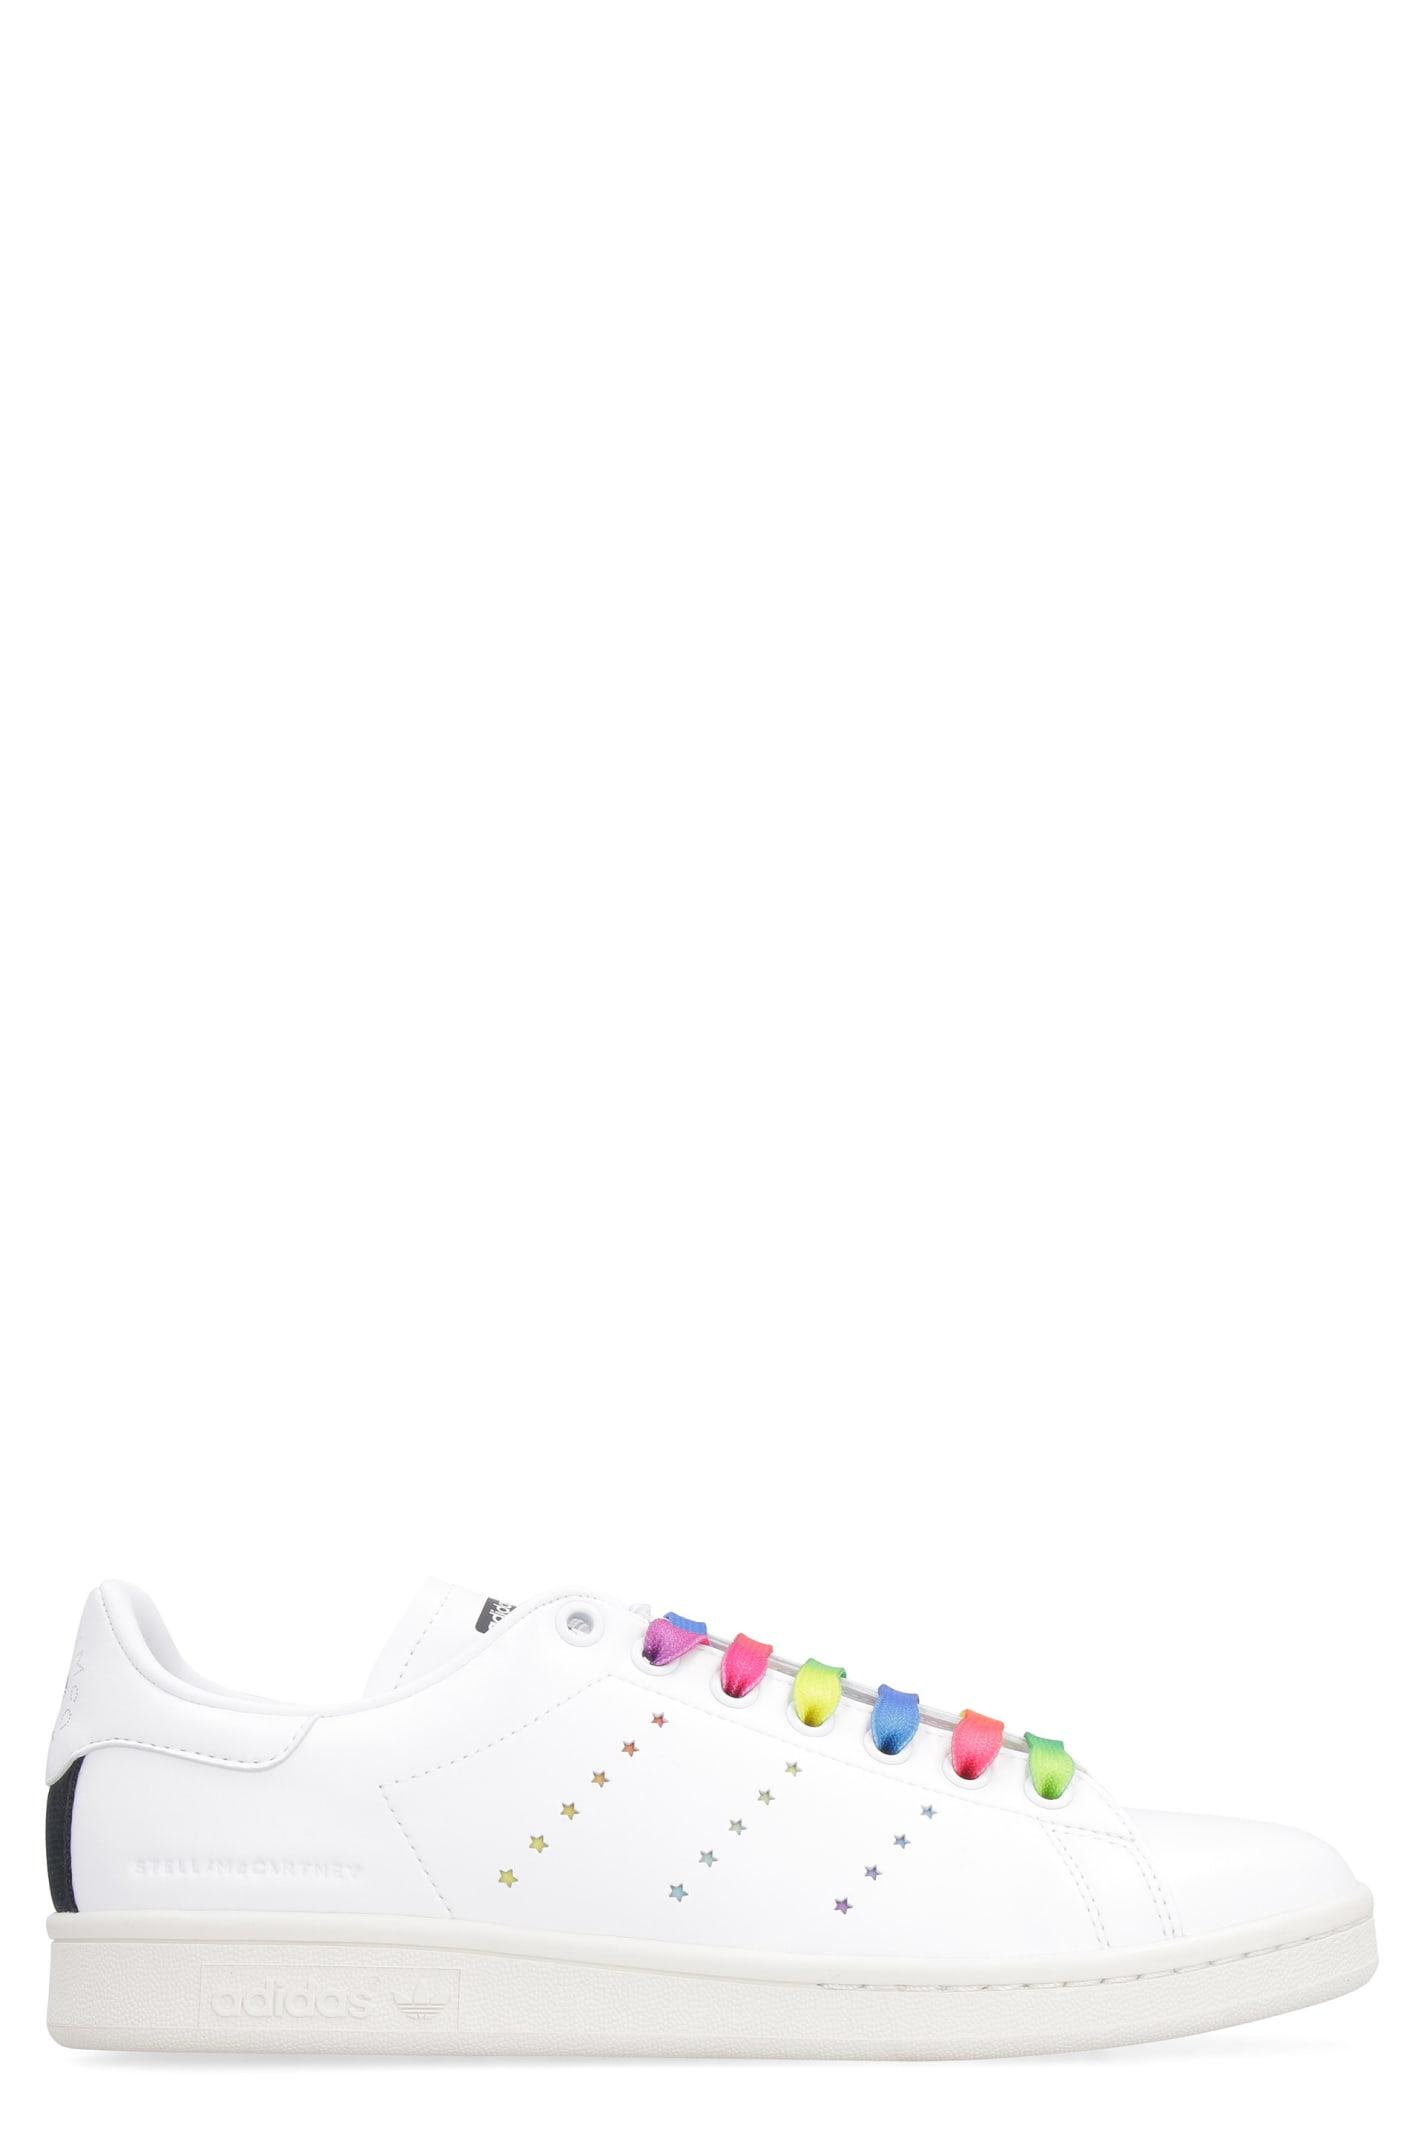 Stella McCartney Stan Smith Adidas By Stella Mccartney Sneakers